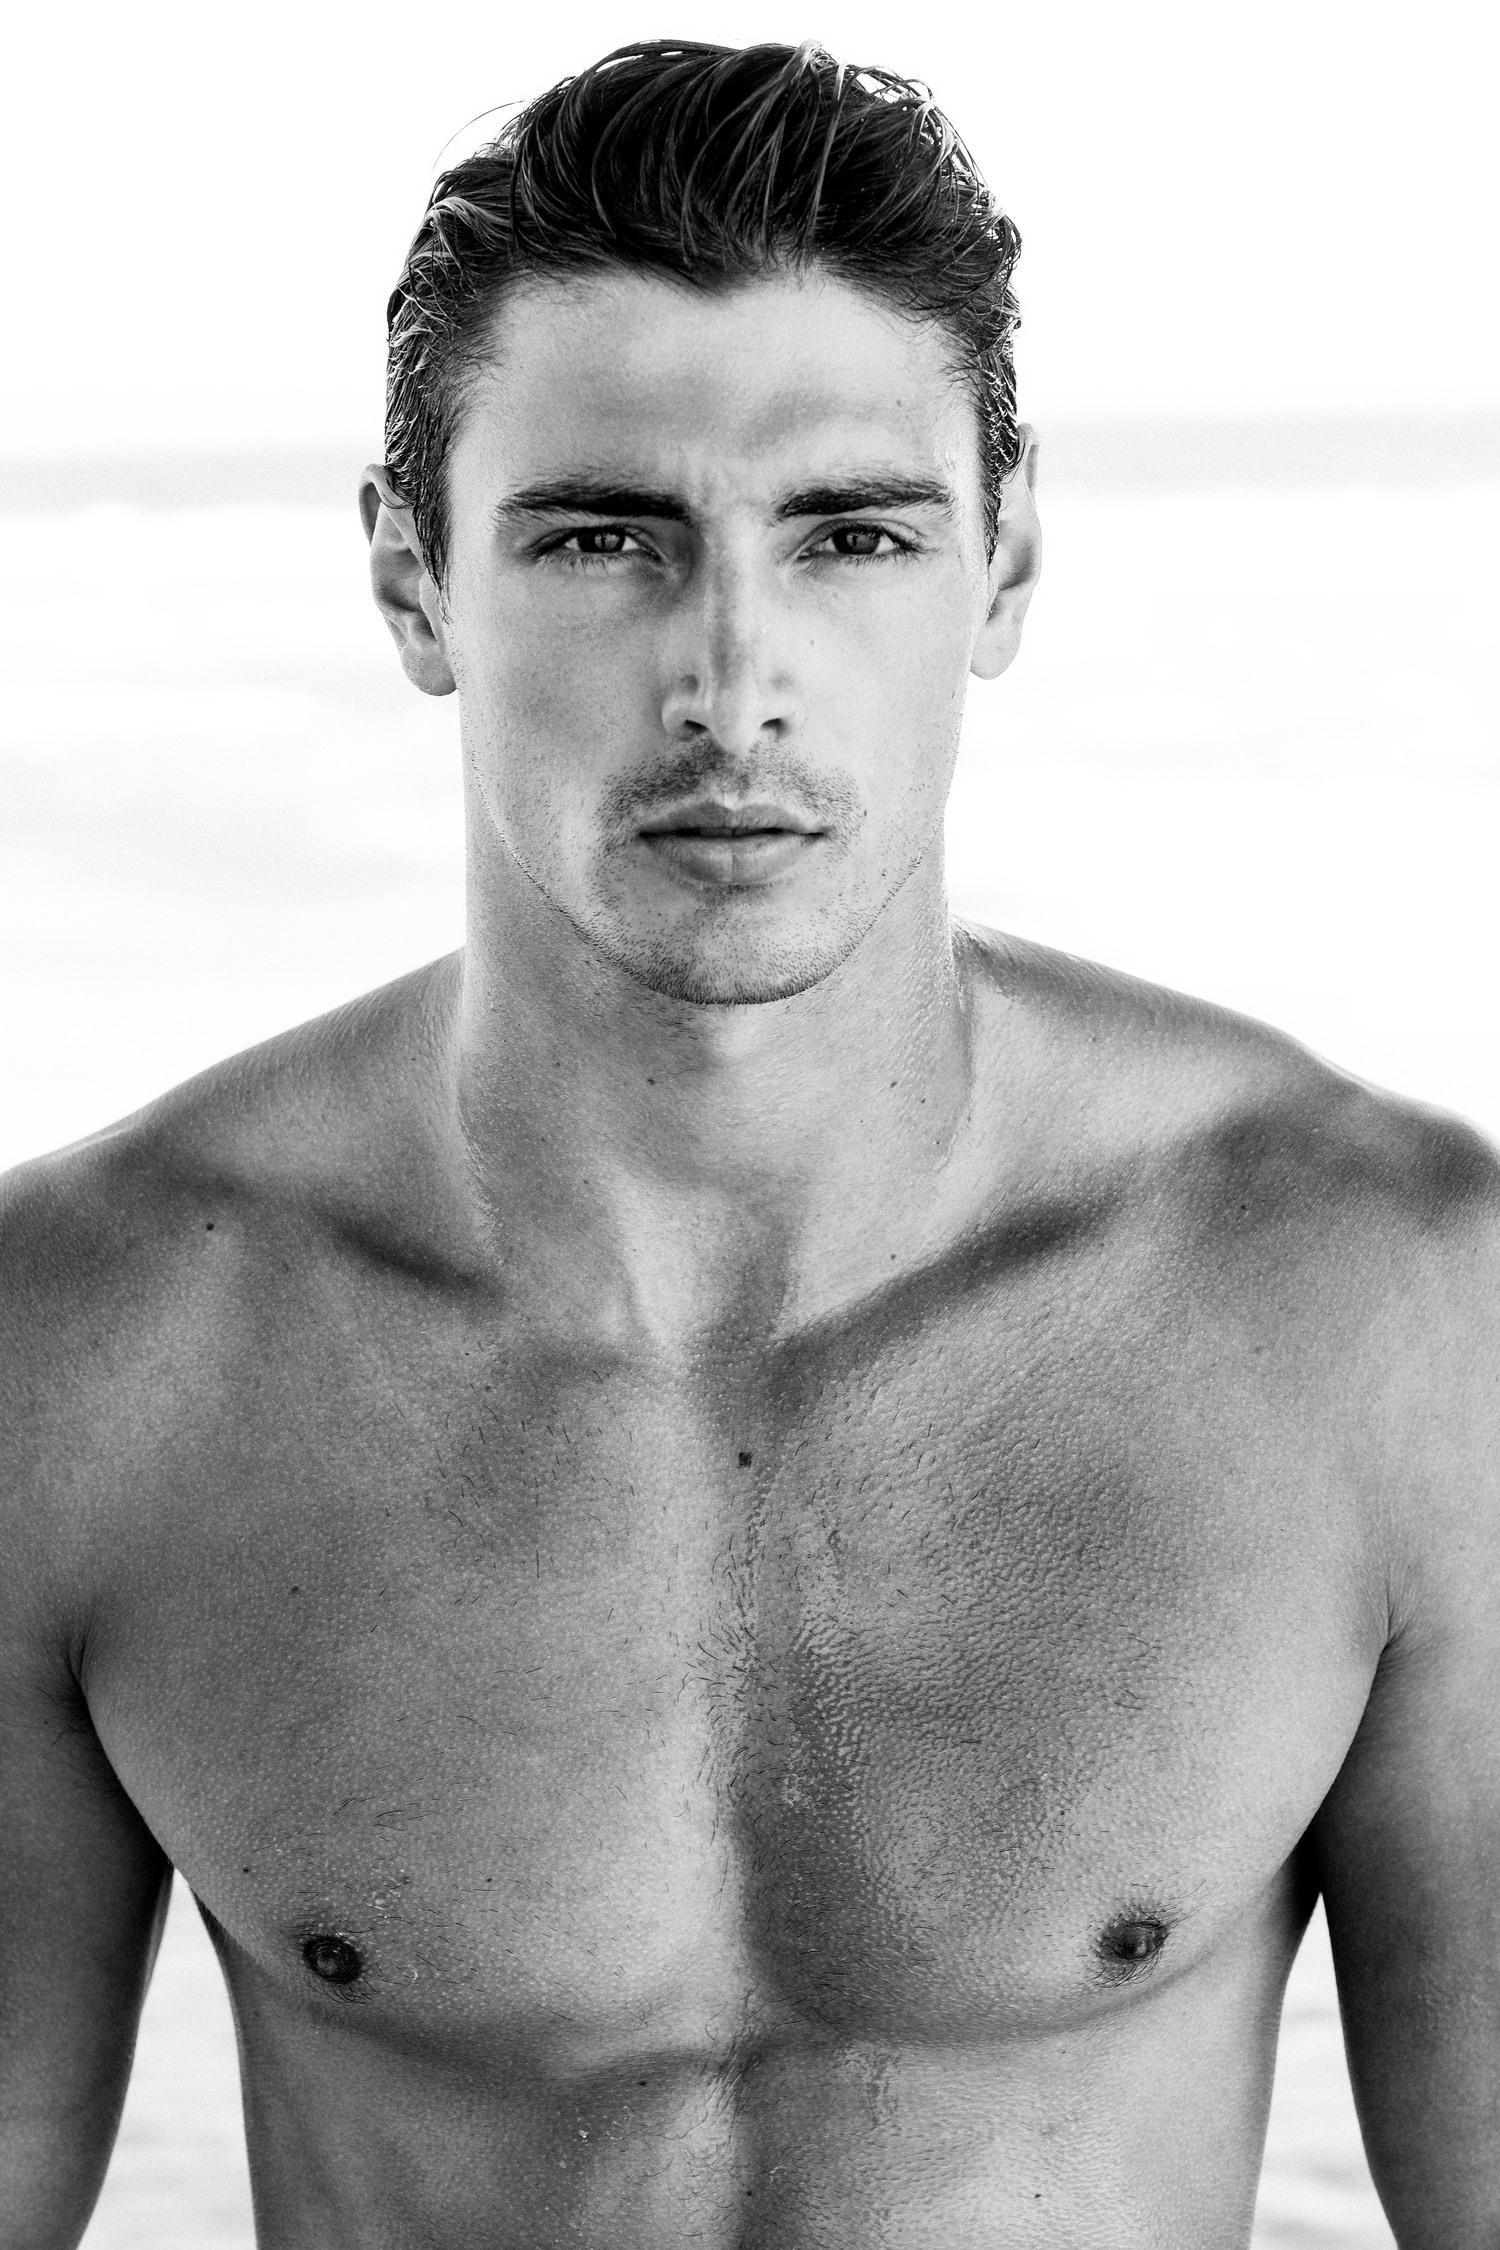 Adon Exclusive: Model Elliott Law By Blake Ballard